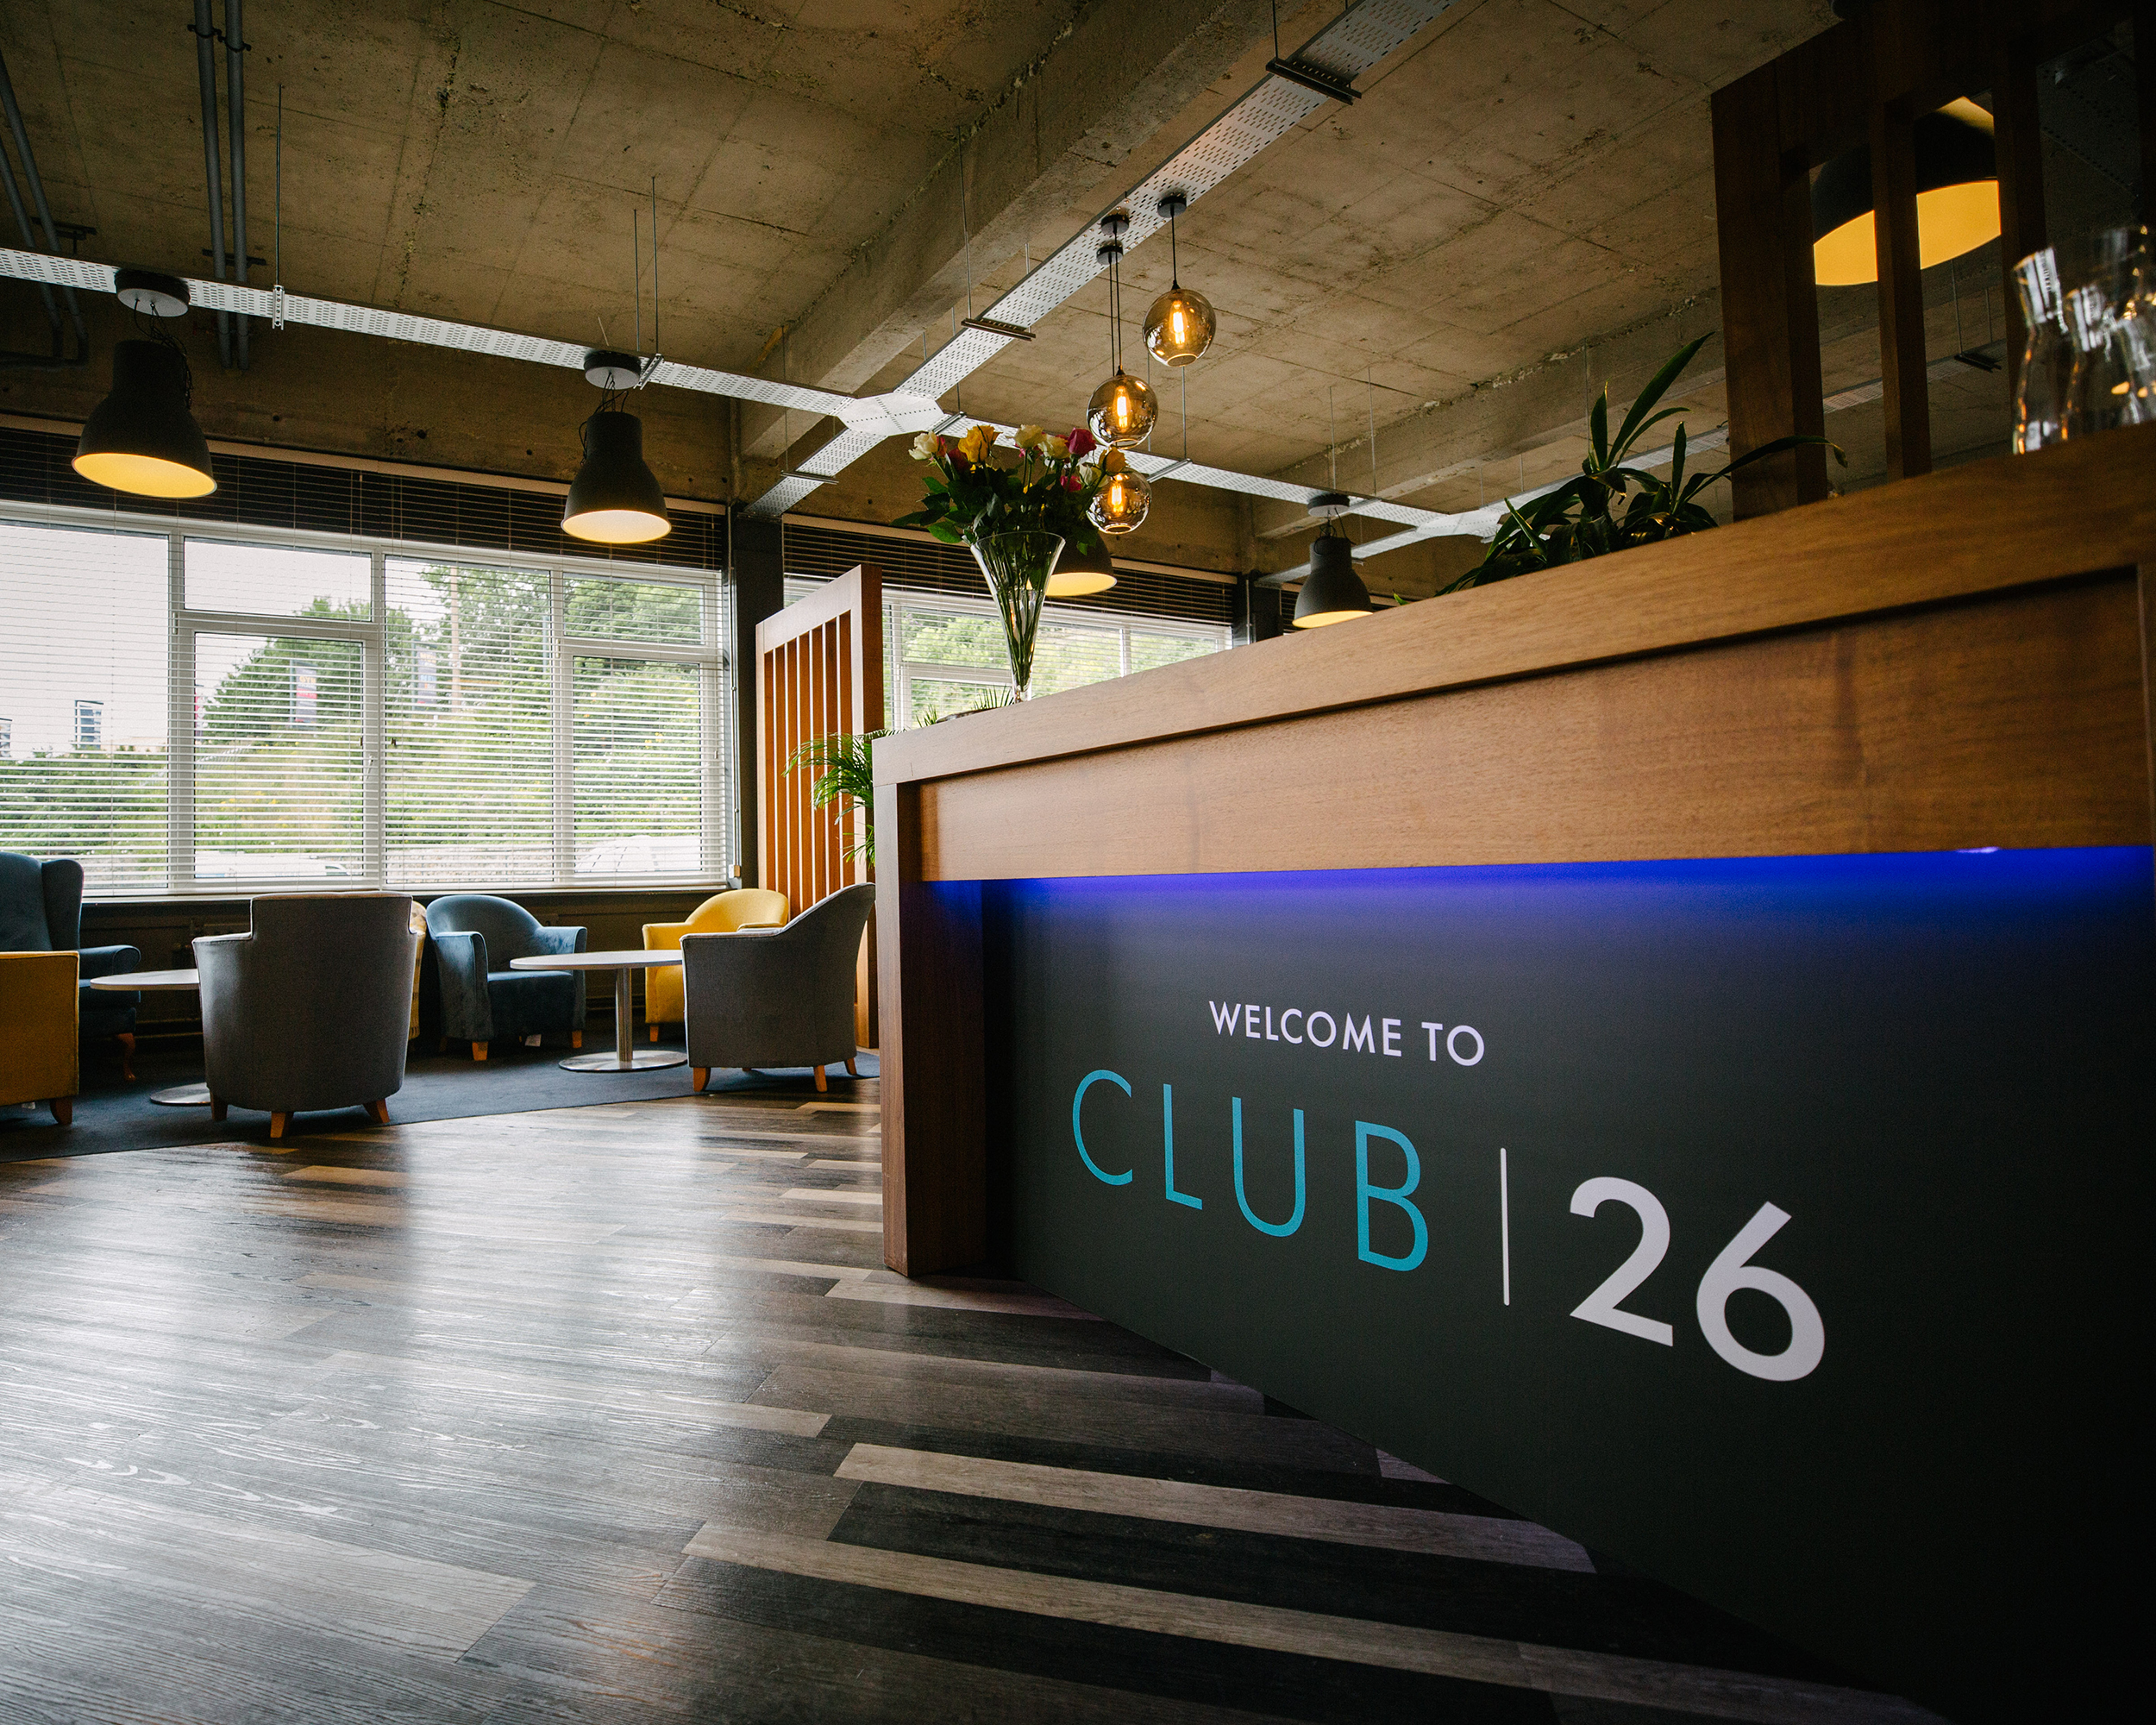 hub26 meet - club26 covid19 sign in